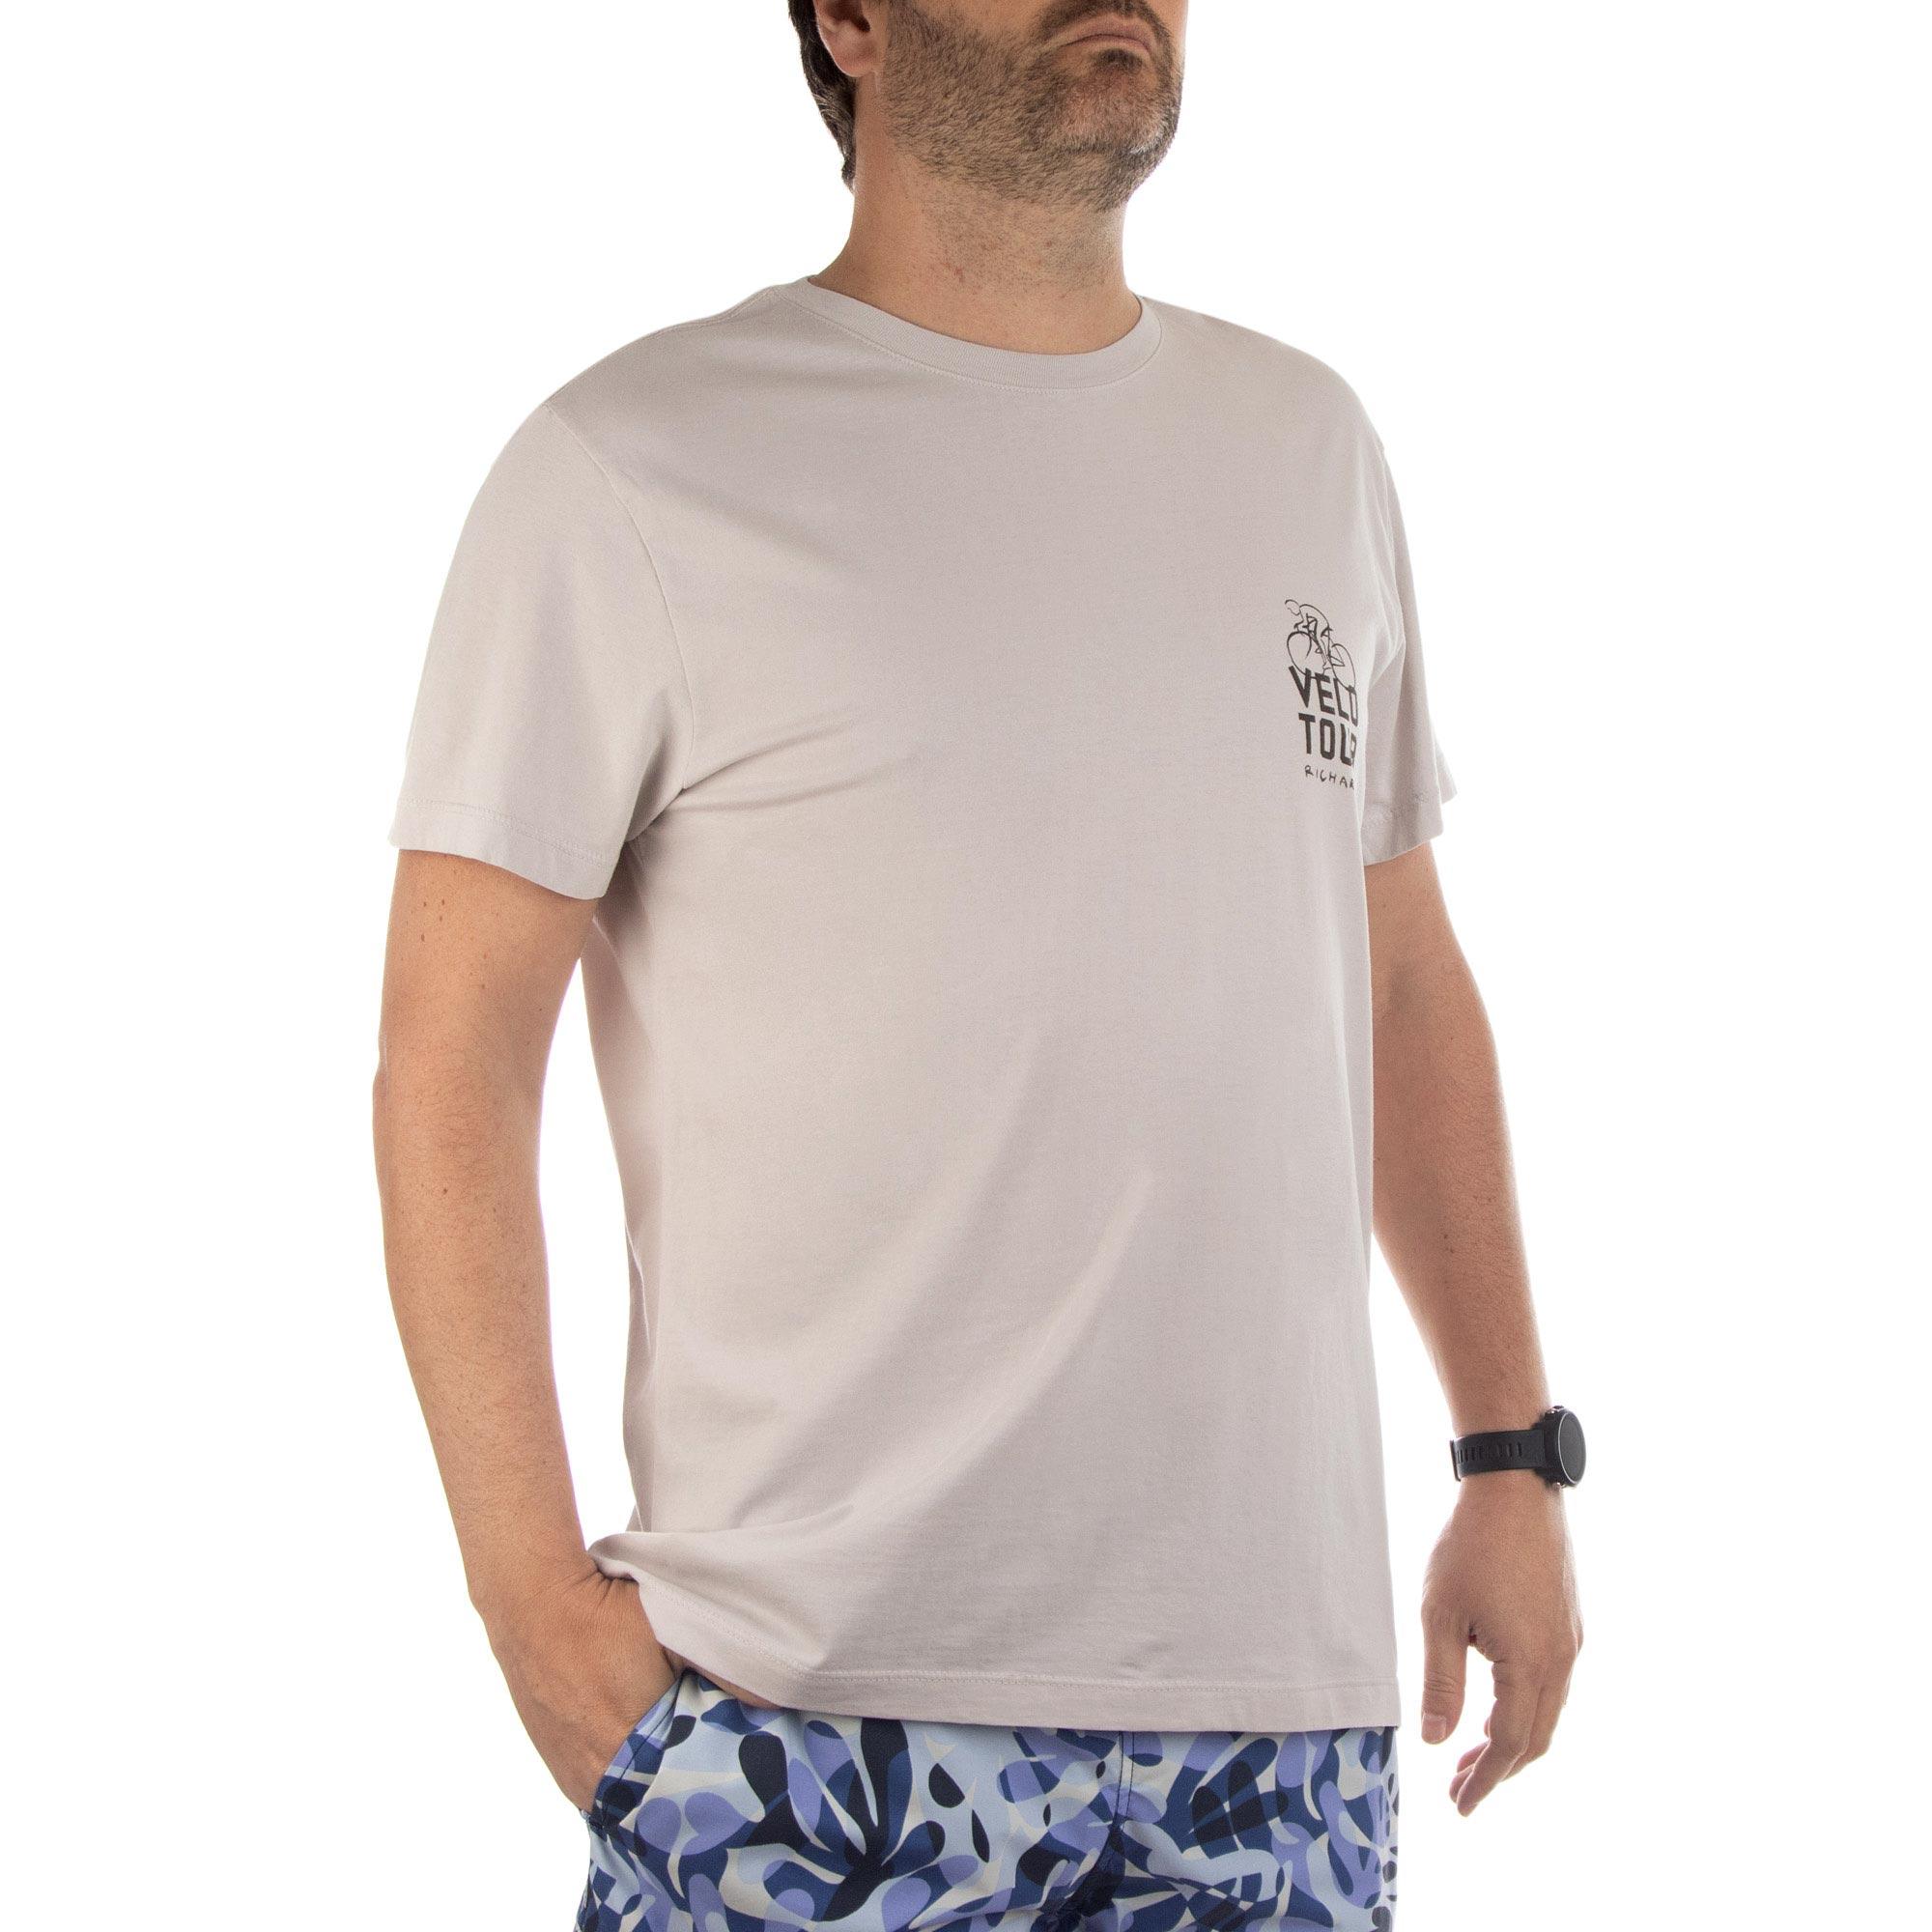 Richards Camiseta Malha Reativo Manga Curta Masculino Areia